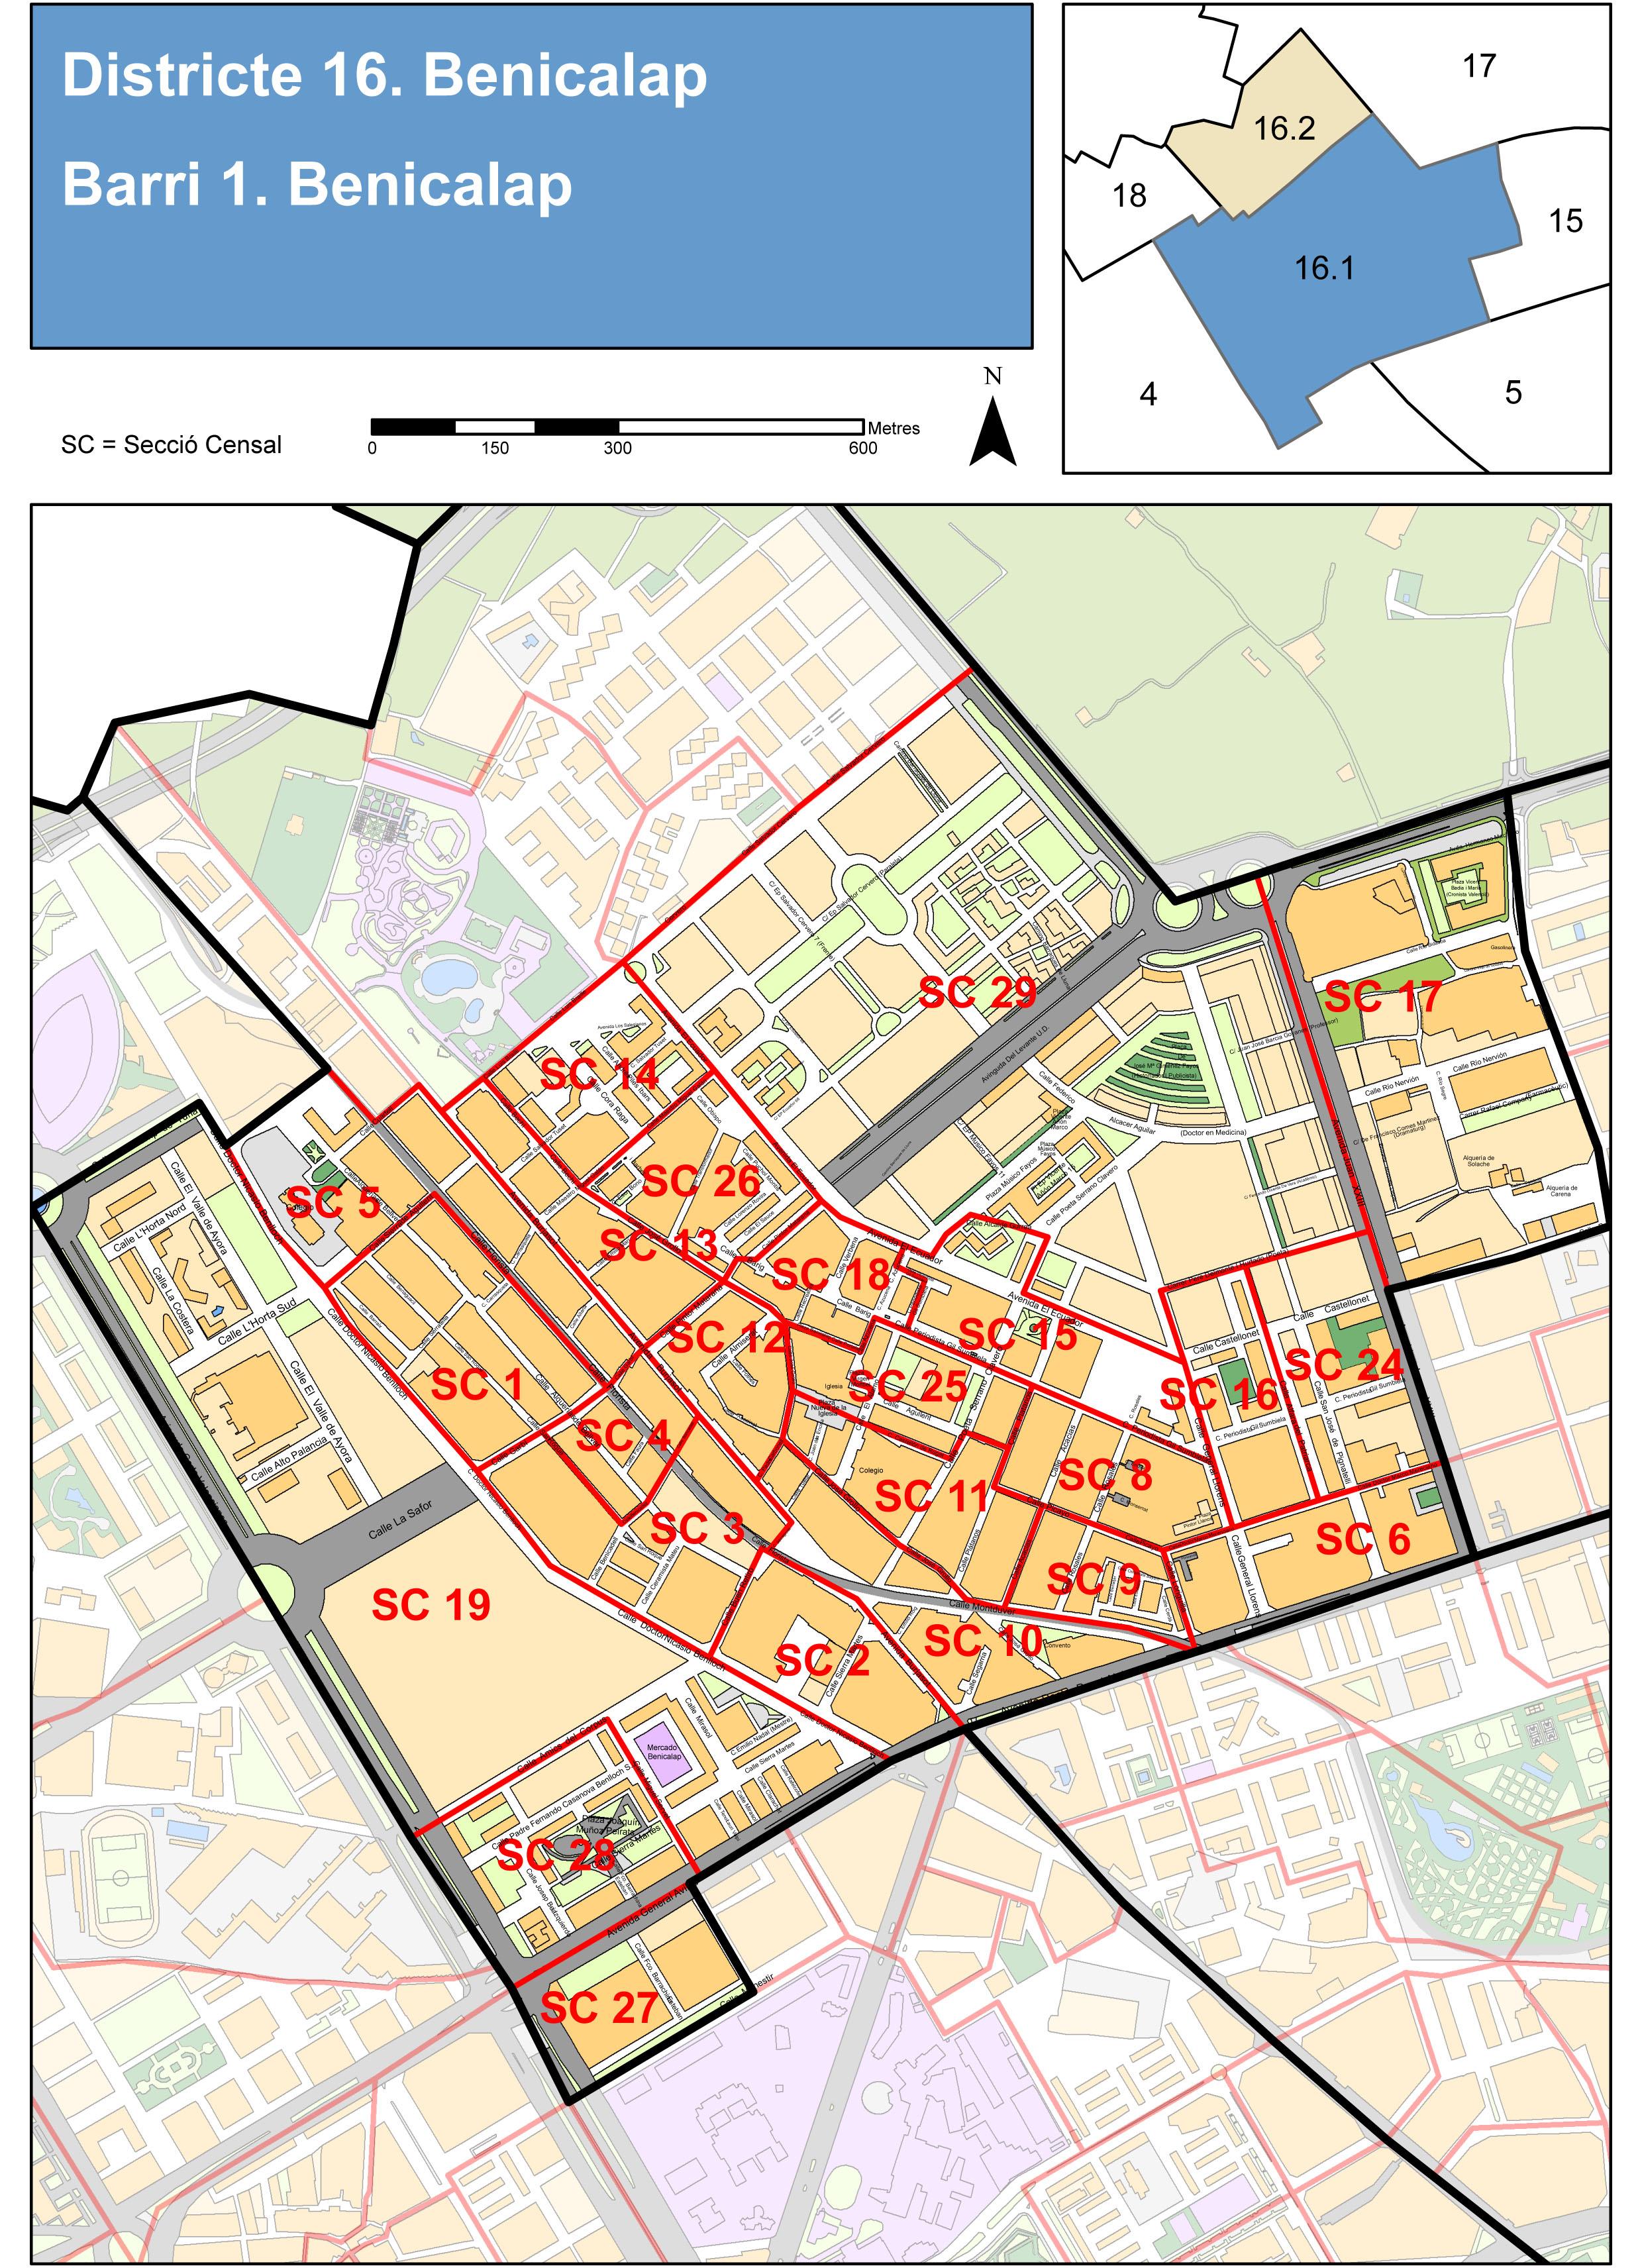 Neighborhood of Benicalap, Valencia